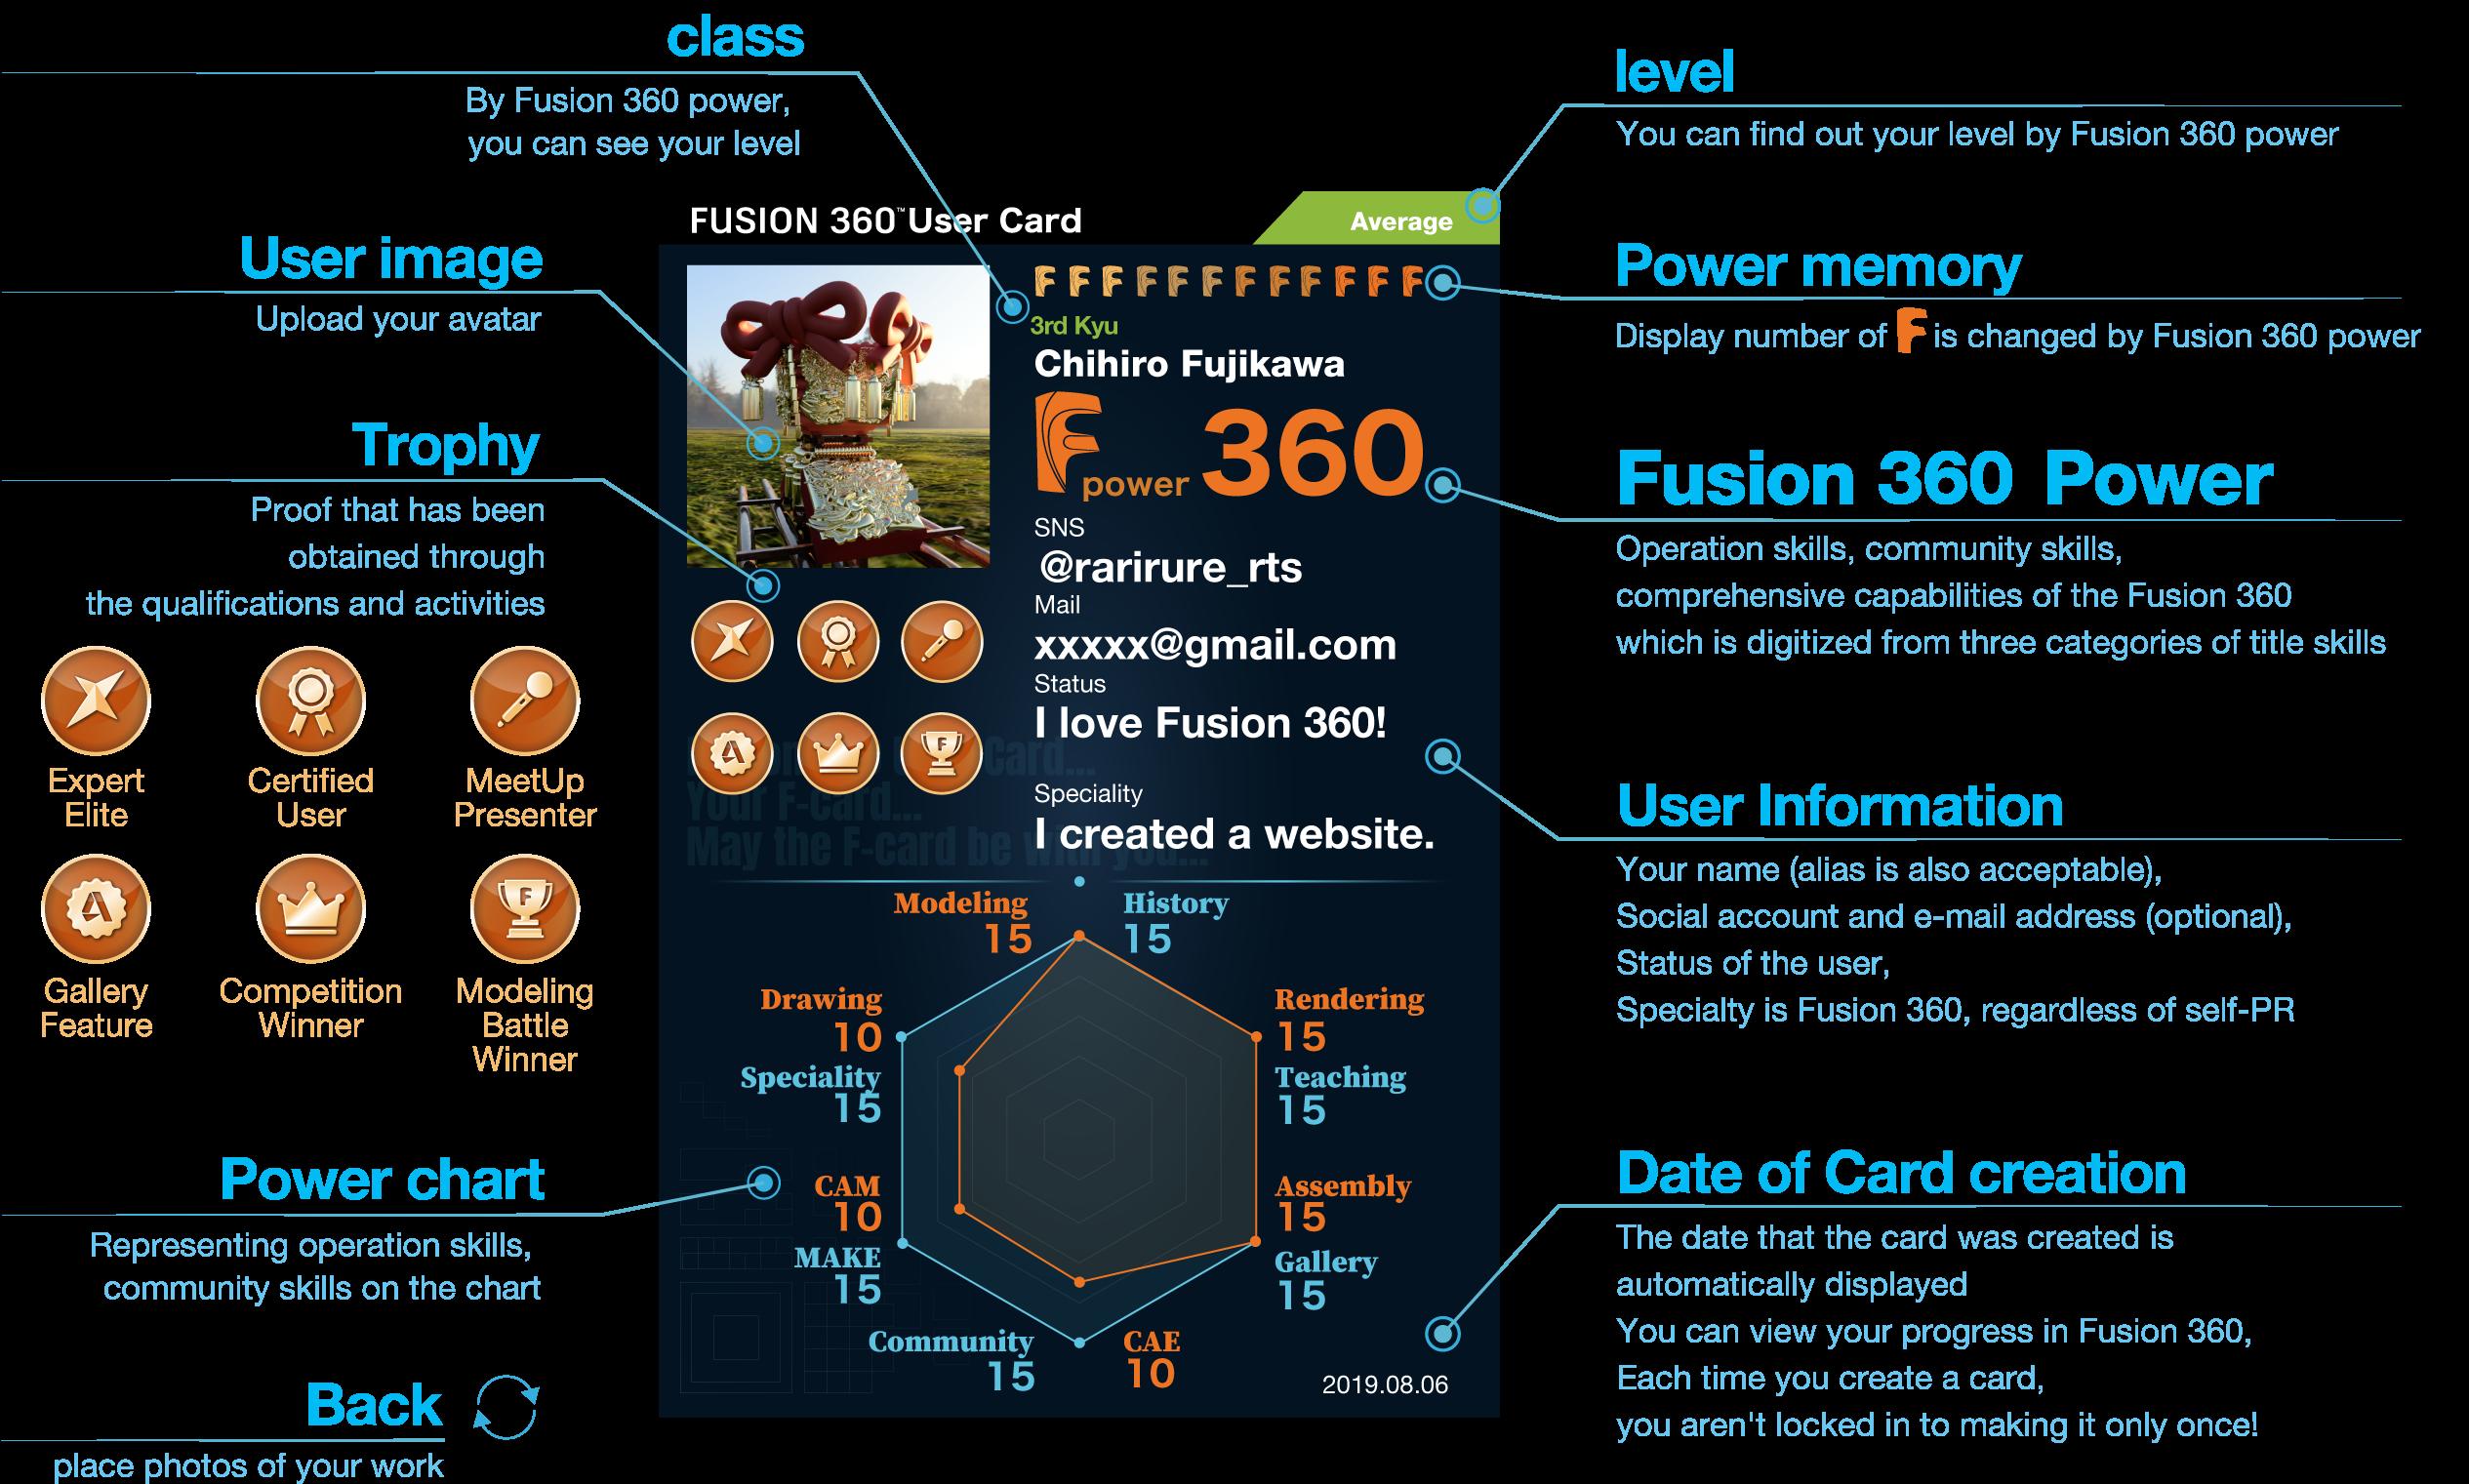 Fusion 360 Power